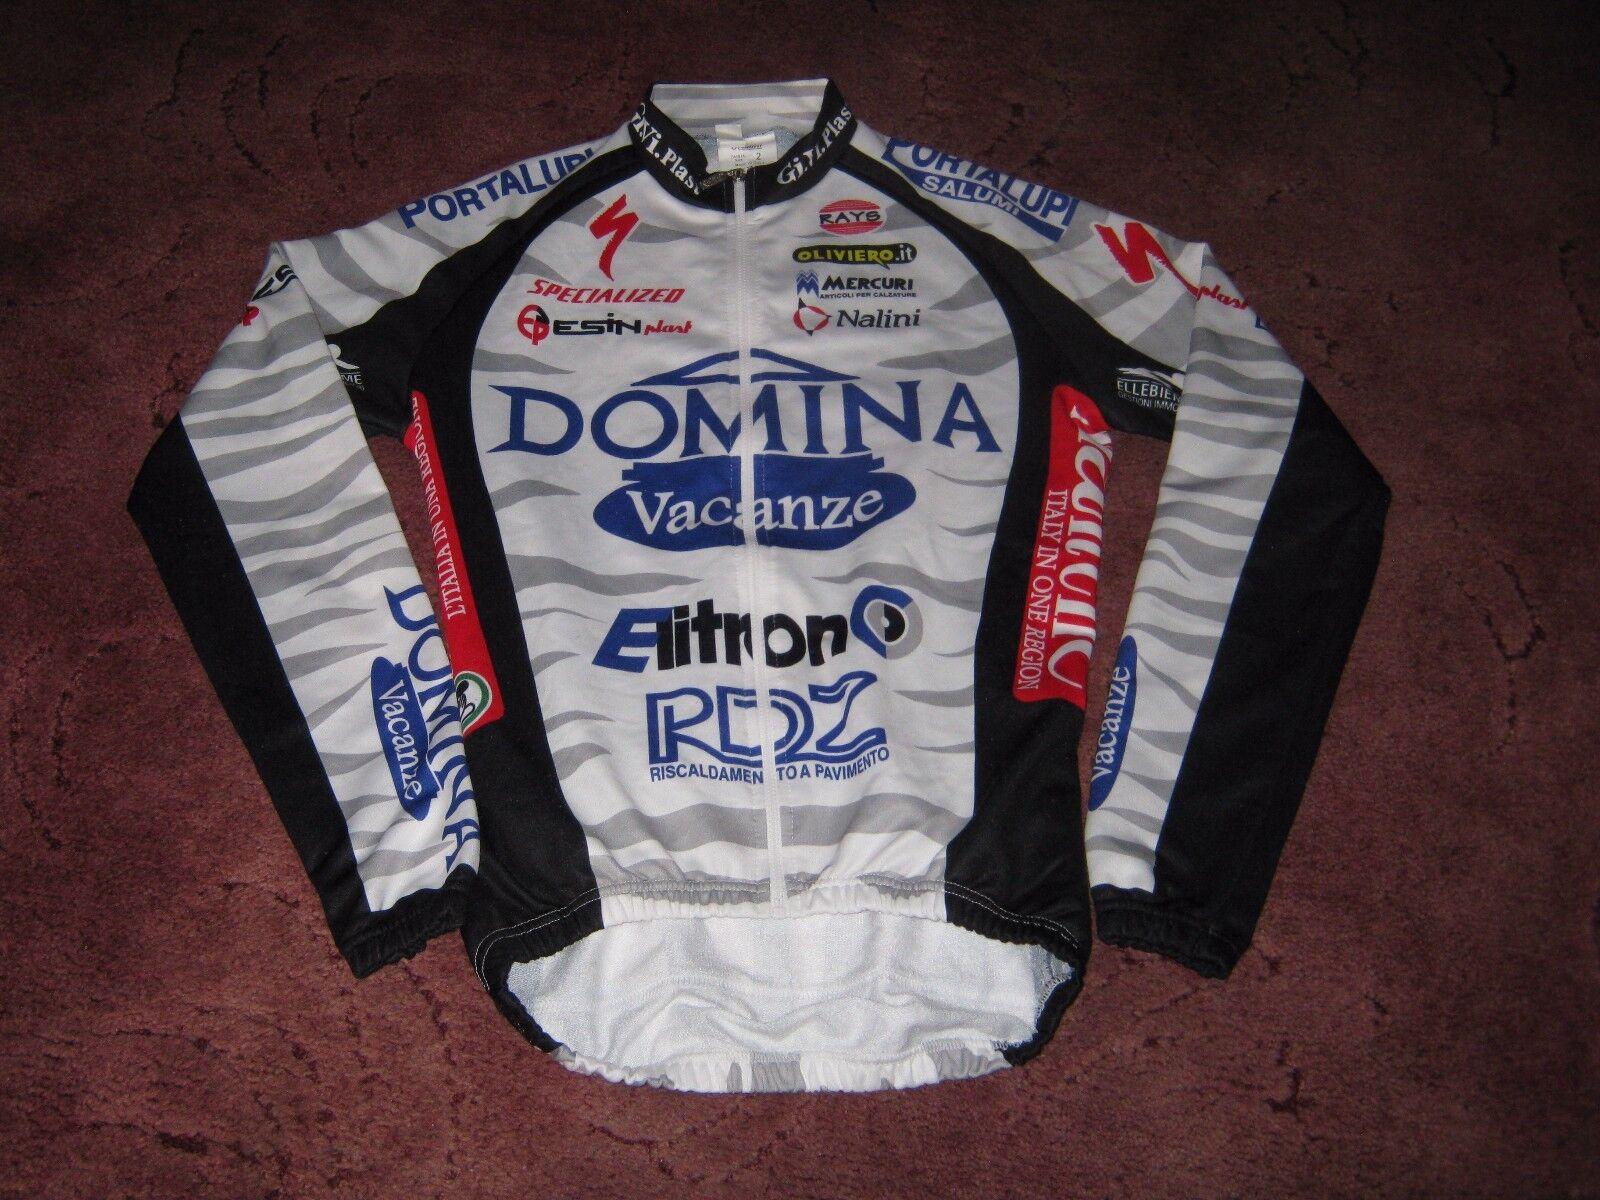 DOMINA VACANZE 2003 NALINI L S CYCLING JERSEY [2] RIDER ISSUE  PAOLO VALOTI